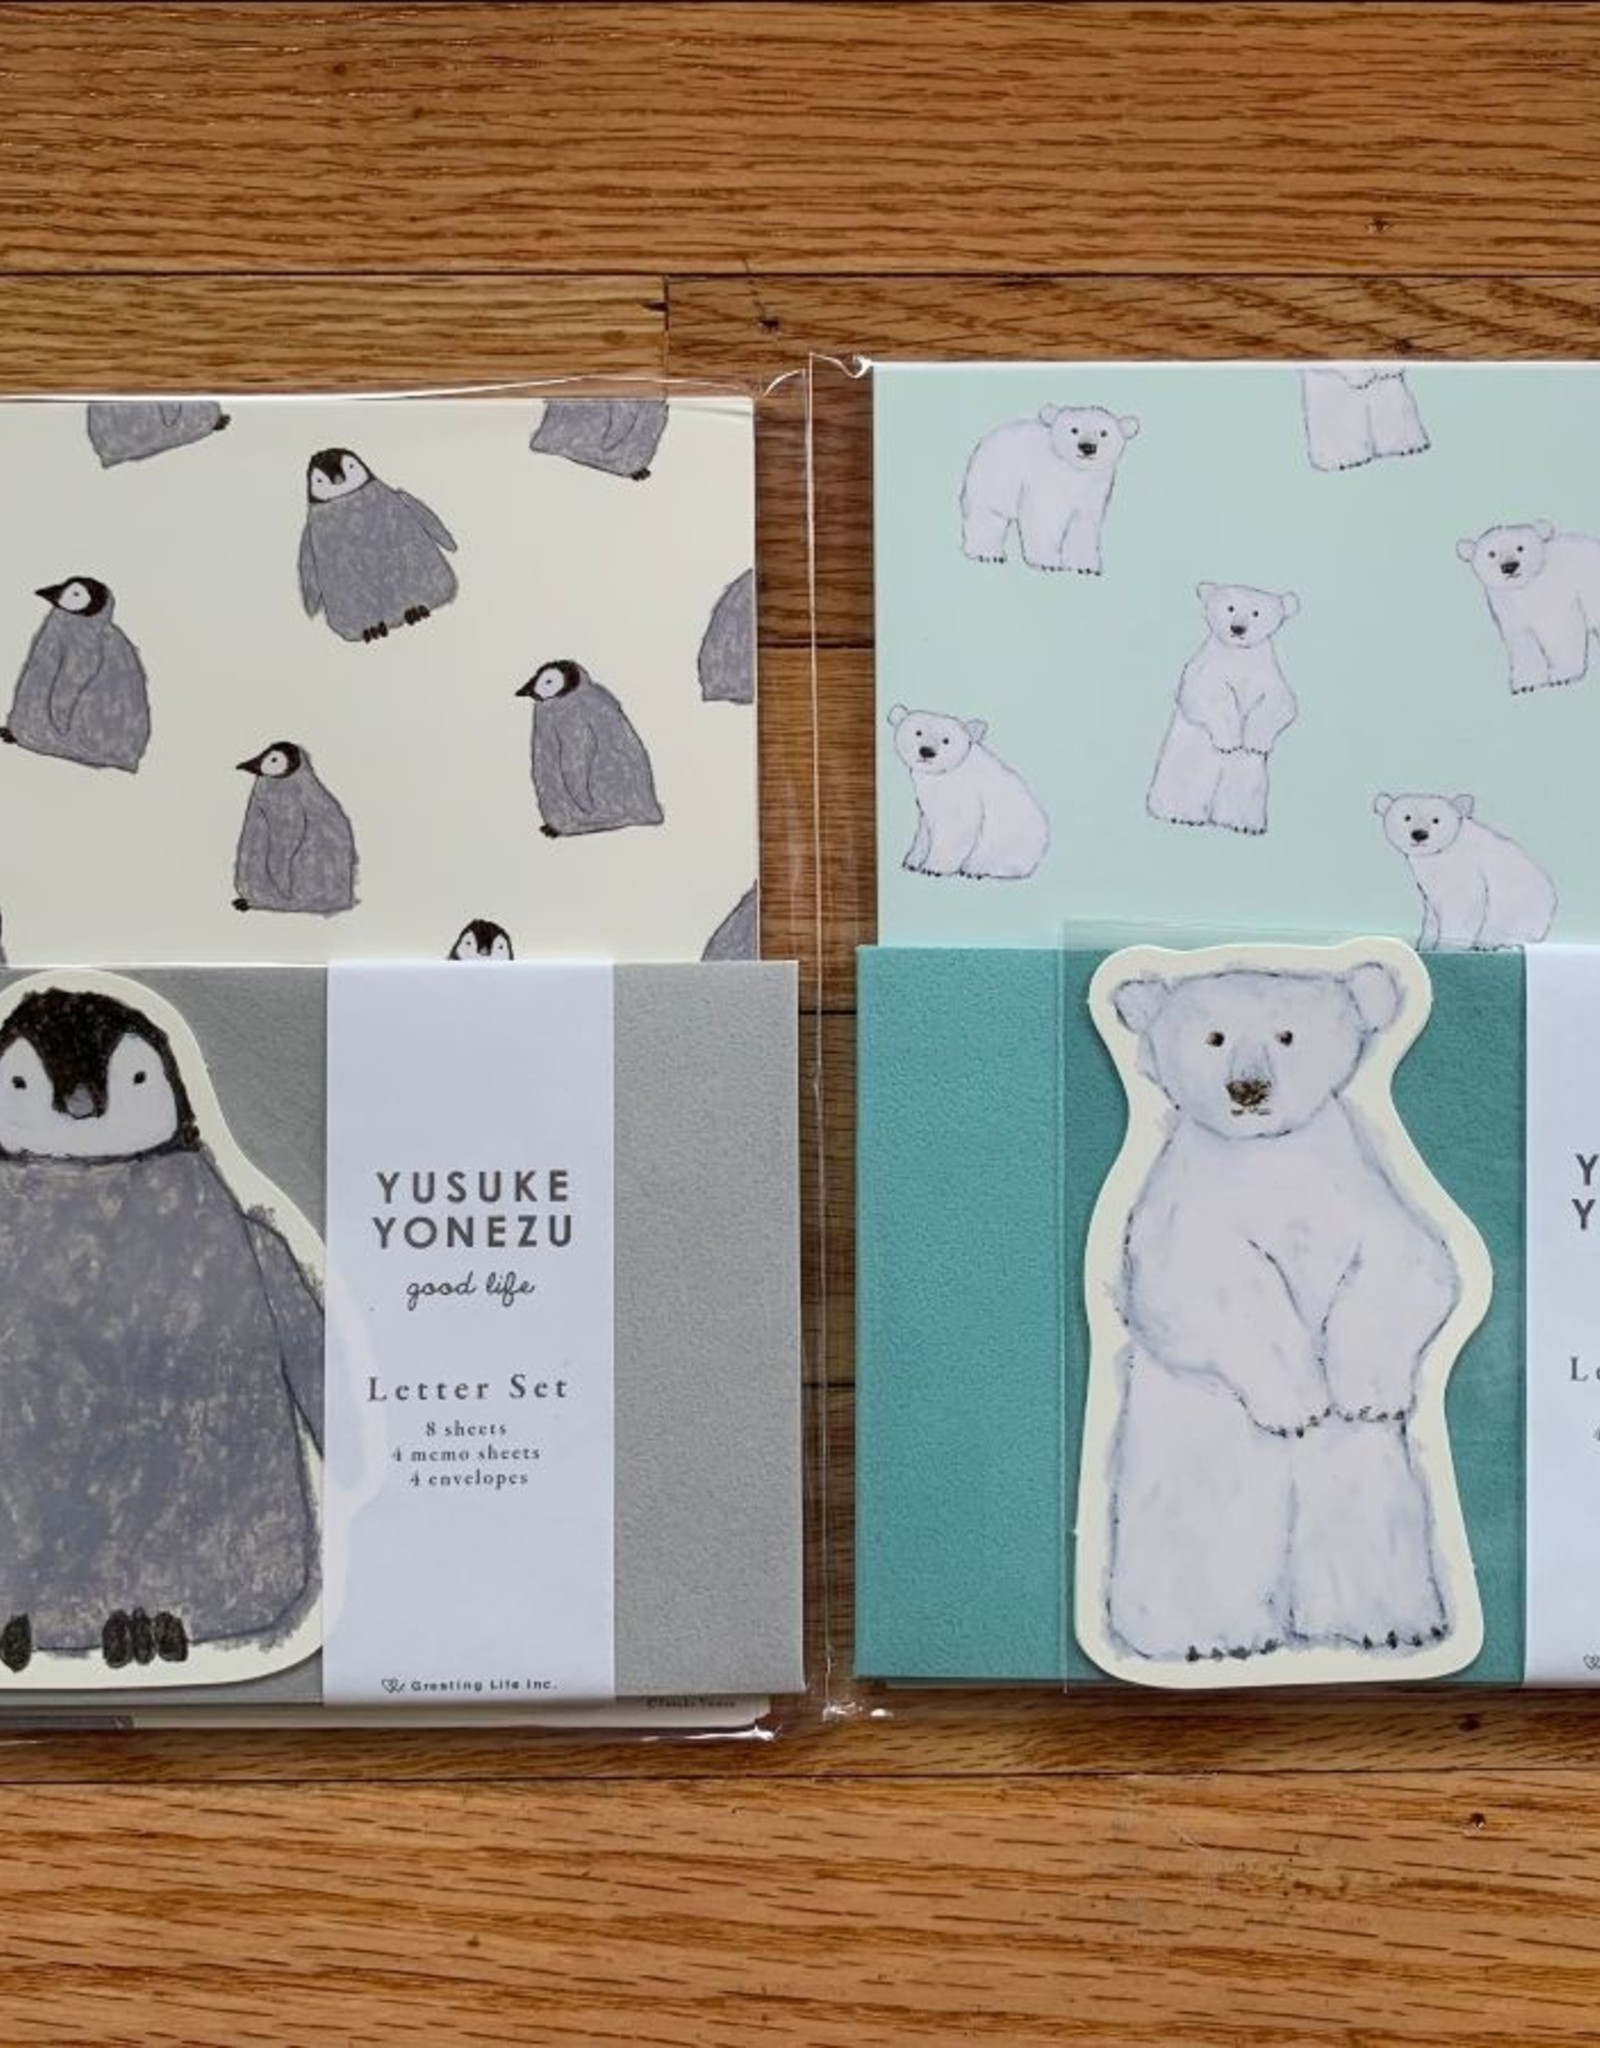 Greeting Life Yusuke Yonezu Letter Set